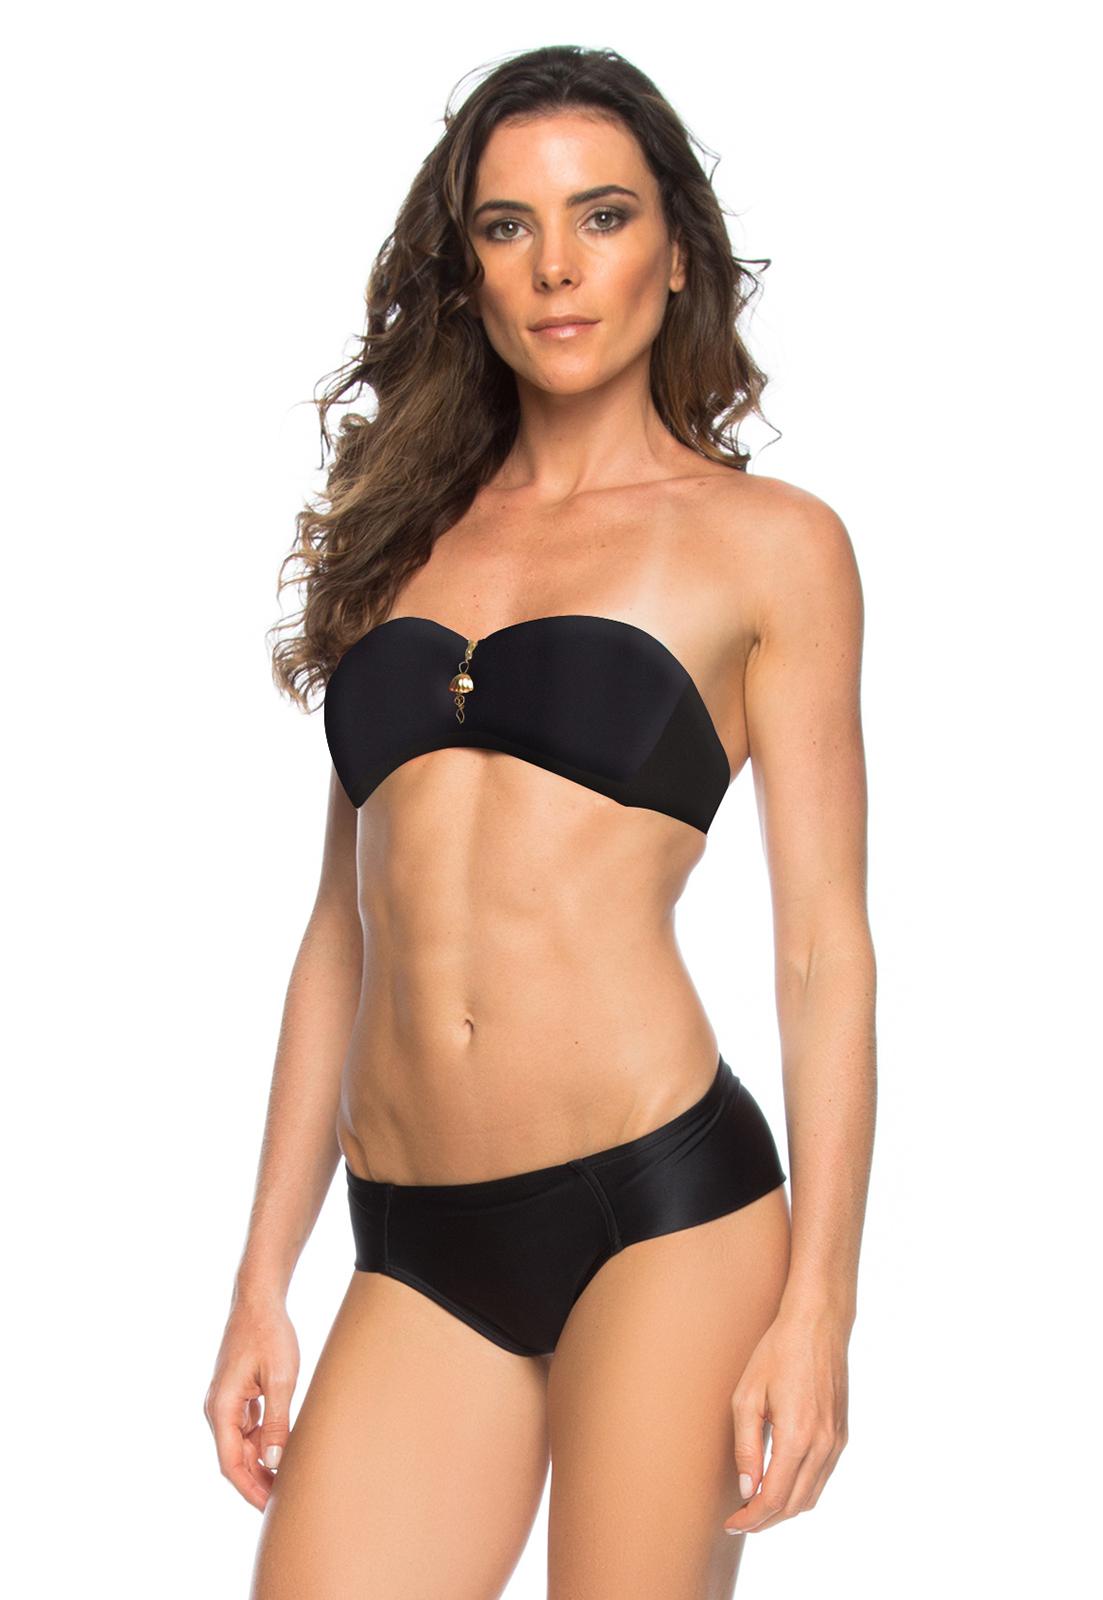 Bikinis Svart Bikini Med Blixtlås - Raquel - Märke Lua Morena 3e02ee7057fa5